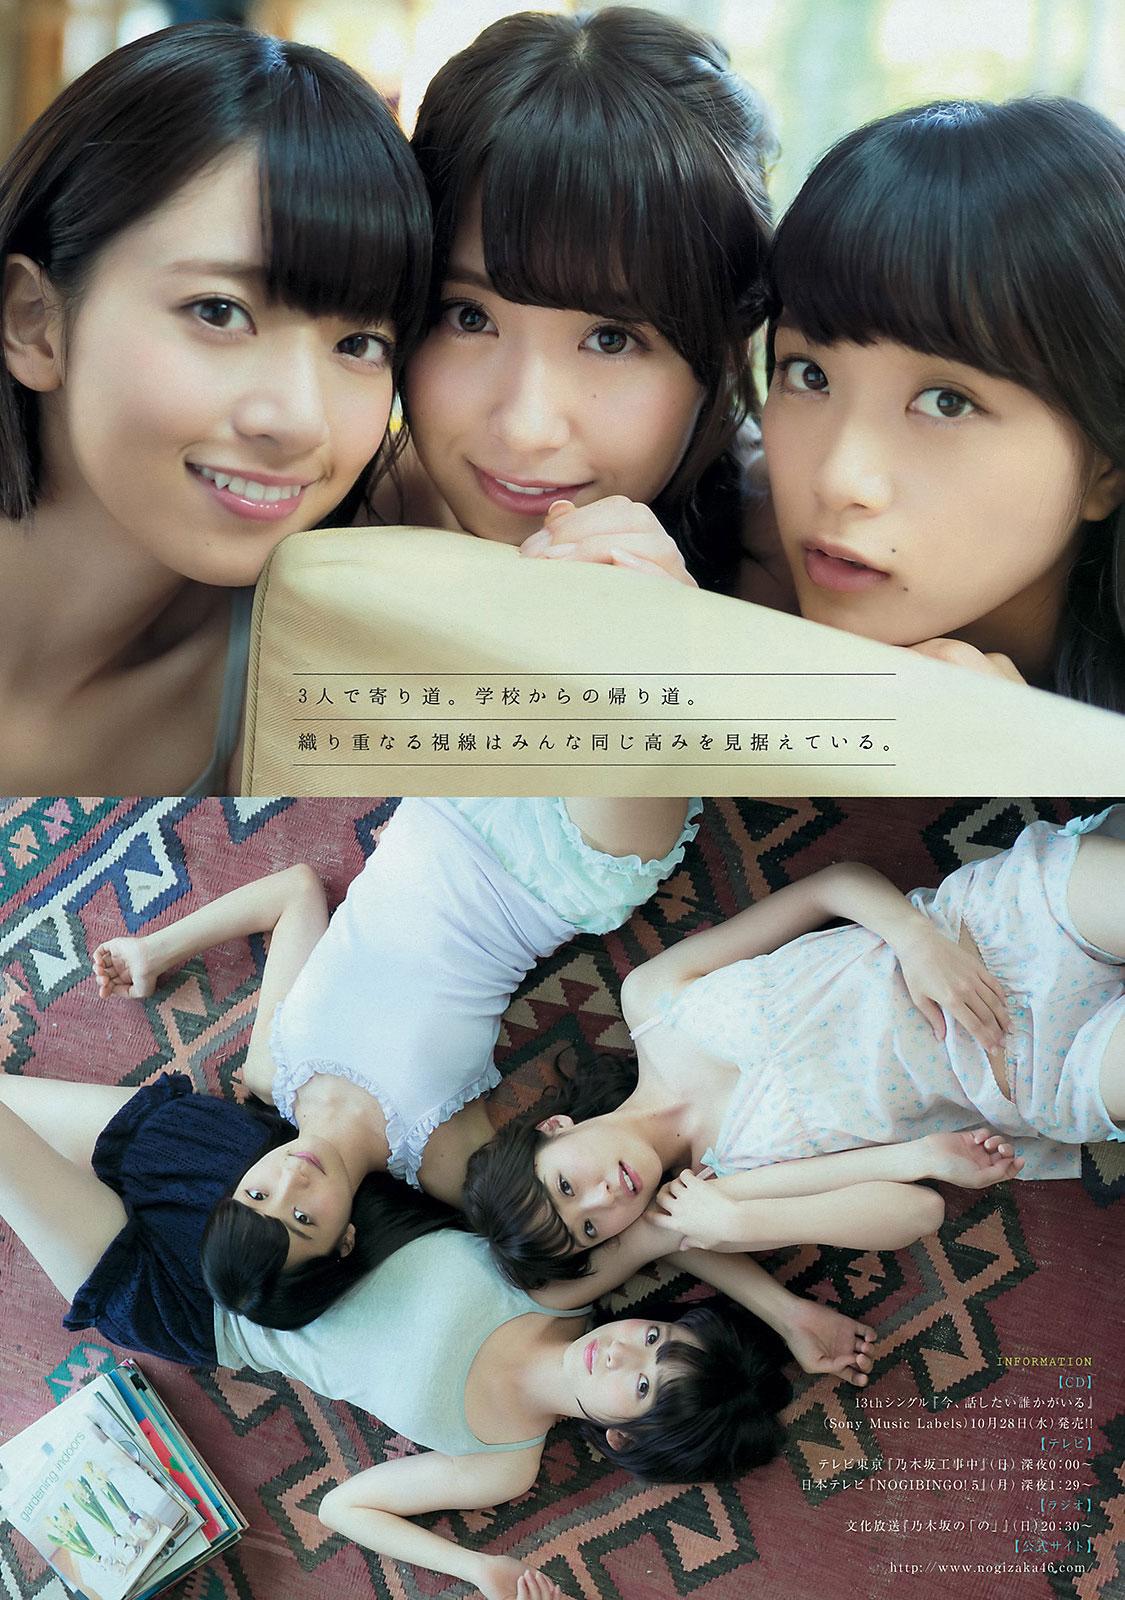 Nanami Hashimoto, Misa Eto, Mai Fukagawa Weekly Young Magazine